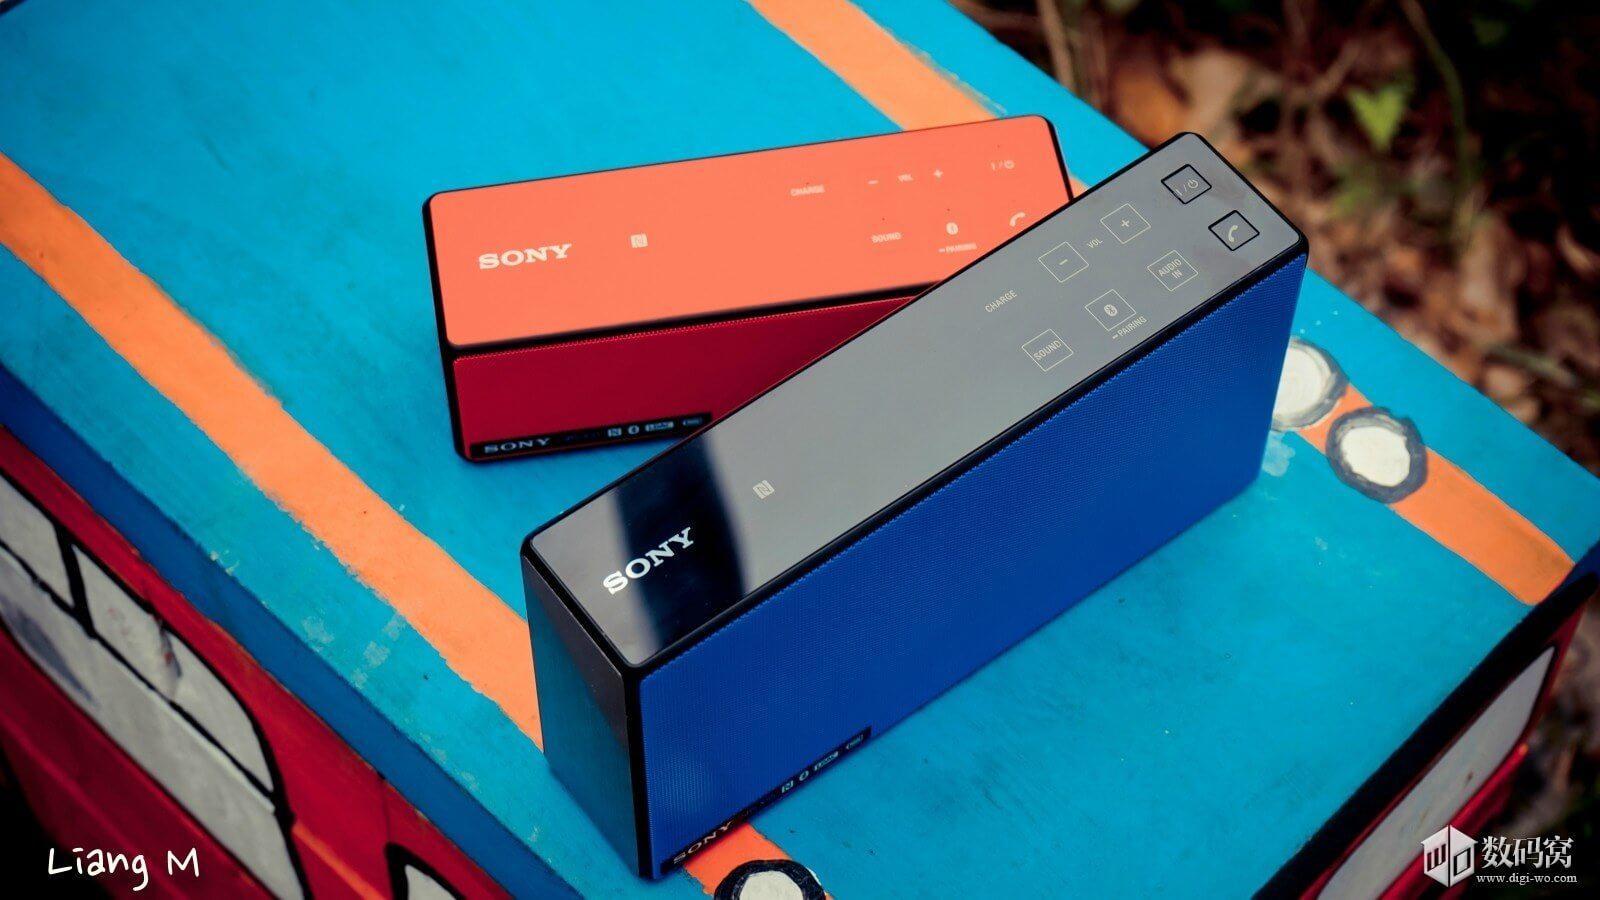 Sony SRS-X55 Bluetooth Speaker hands on